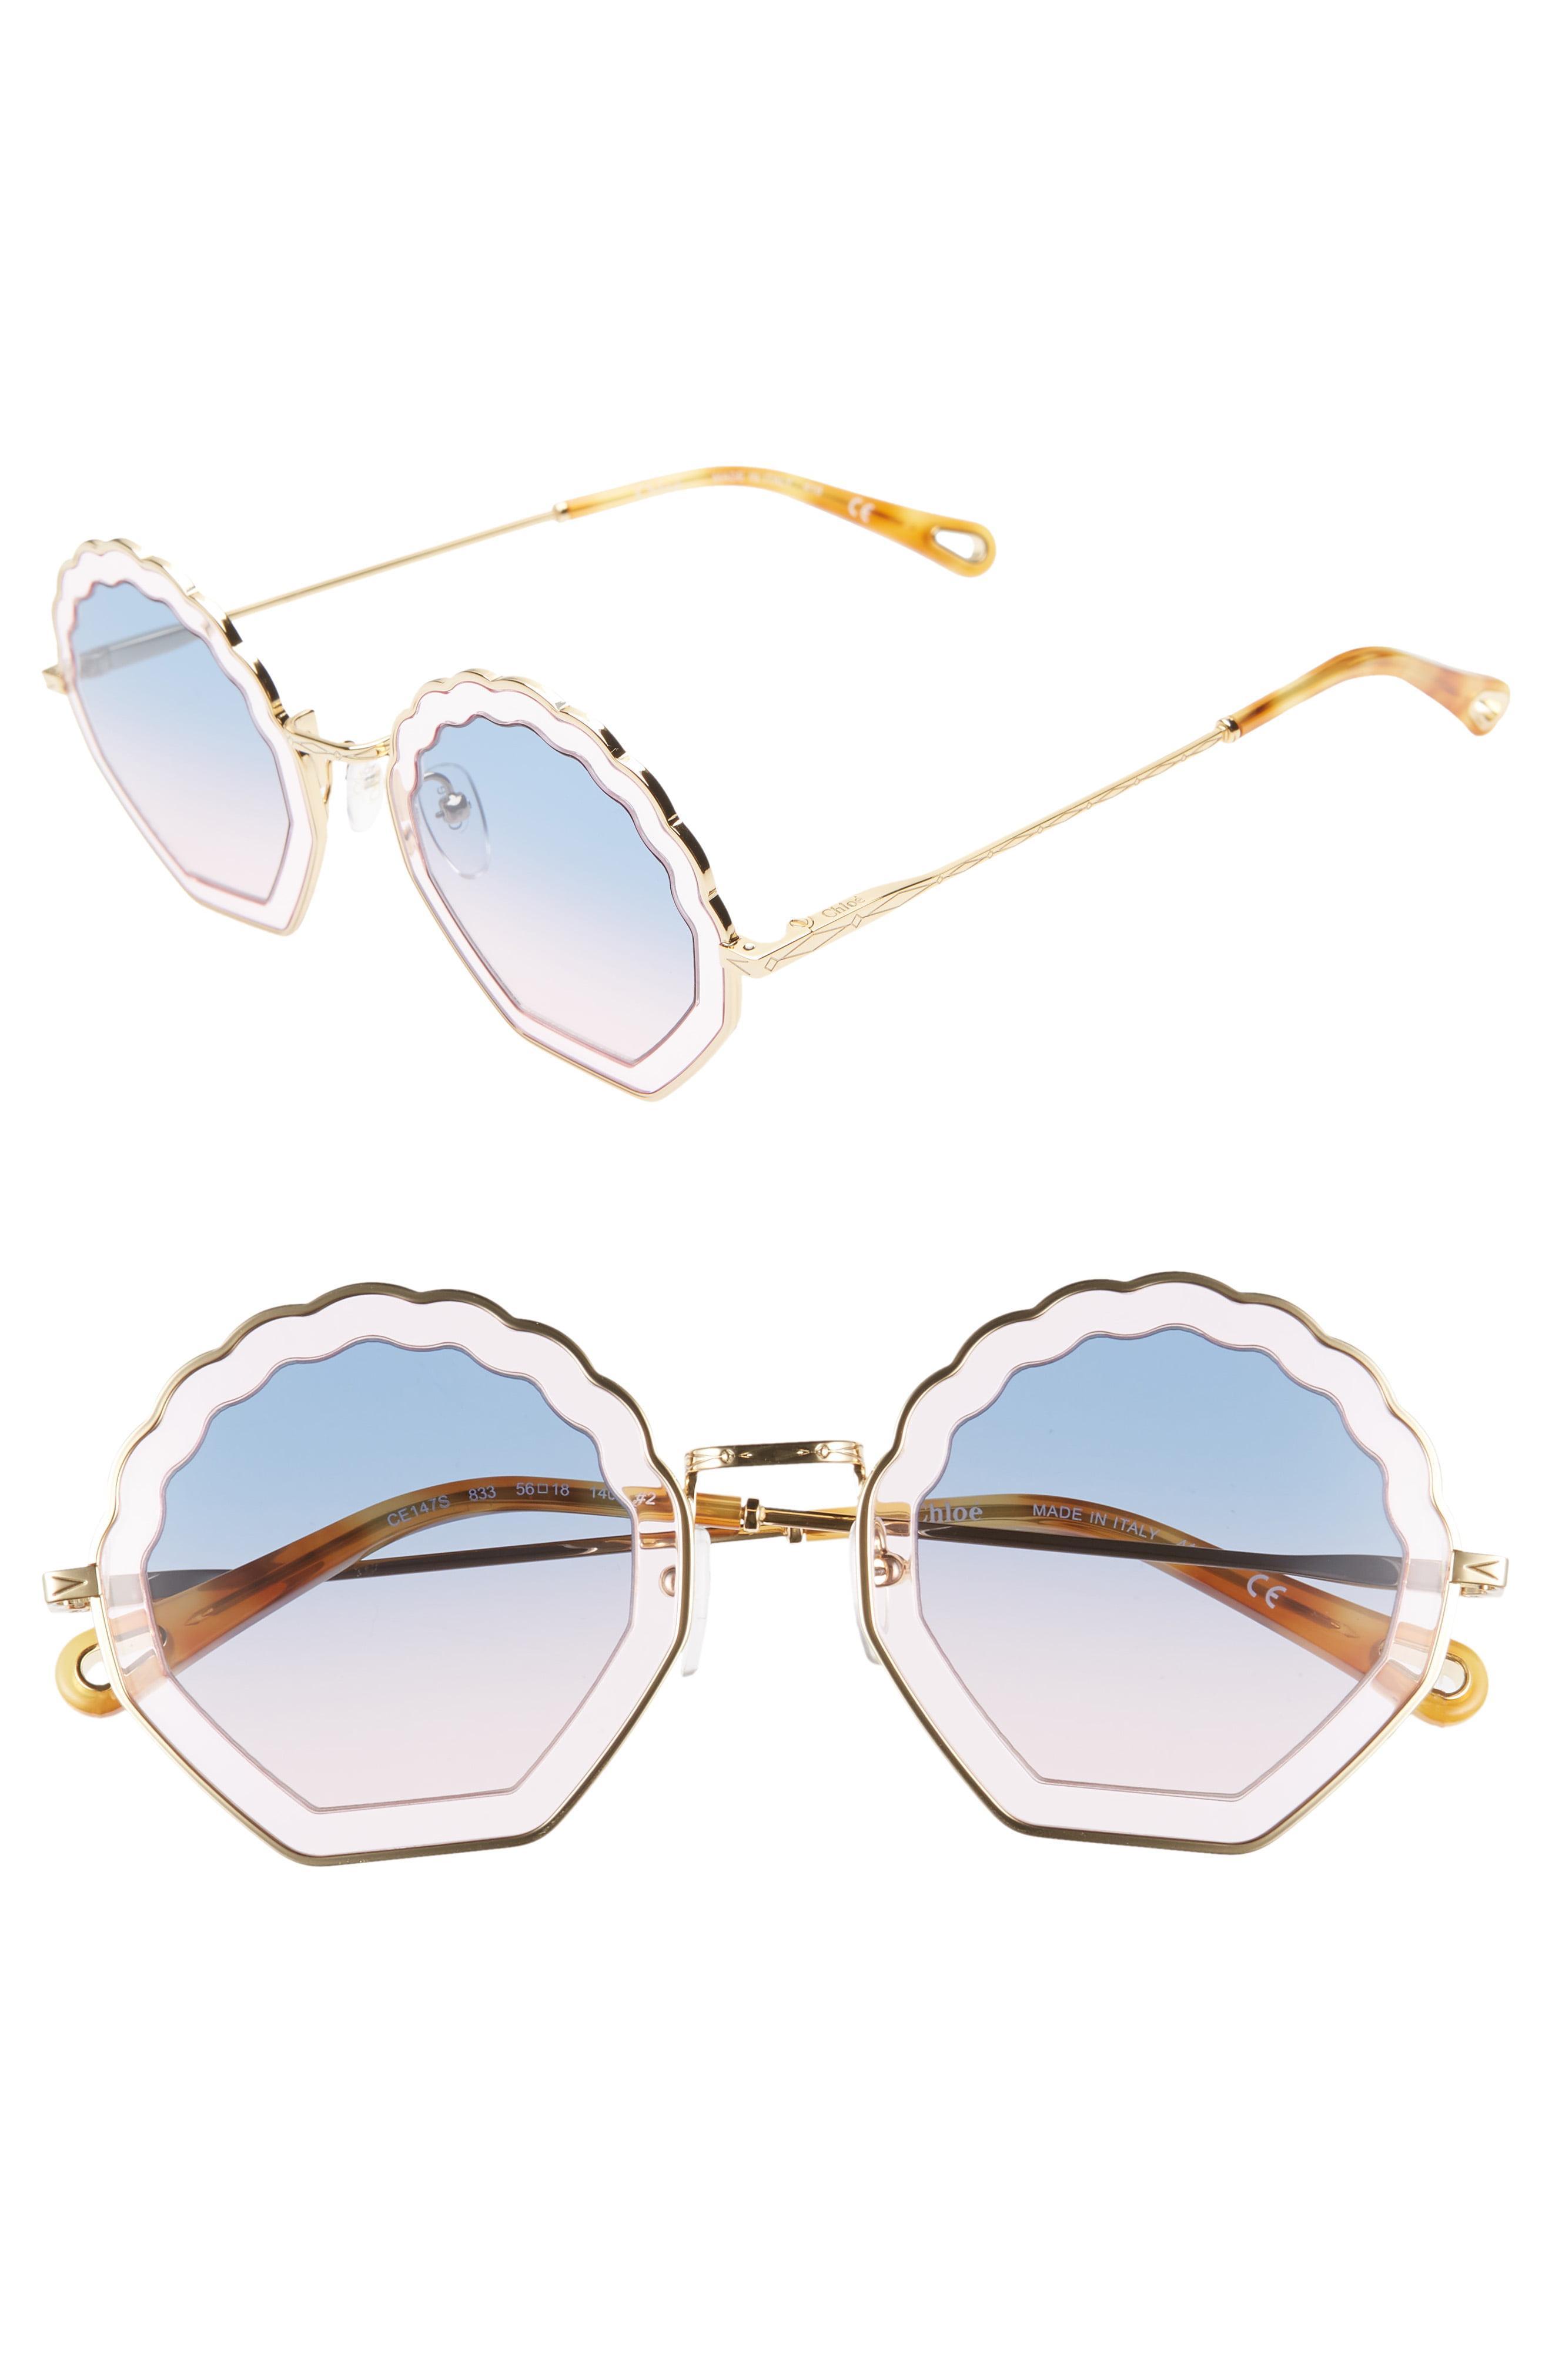 4ce714079e26 Lyst - Chloé Tally 56mm Scalloped Sunglasses in Blue